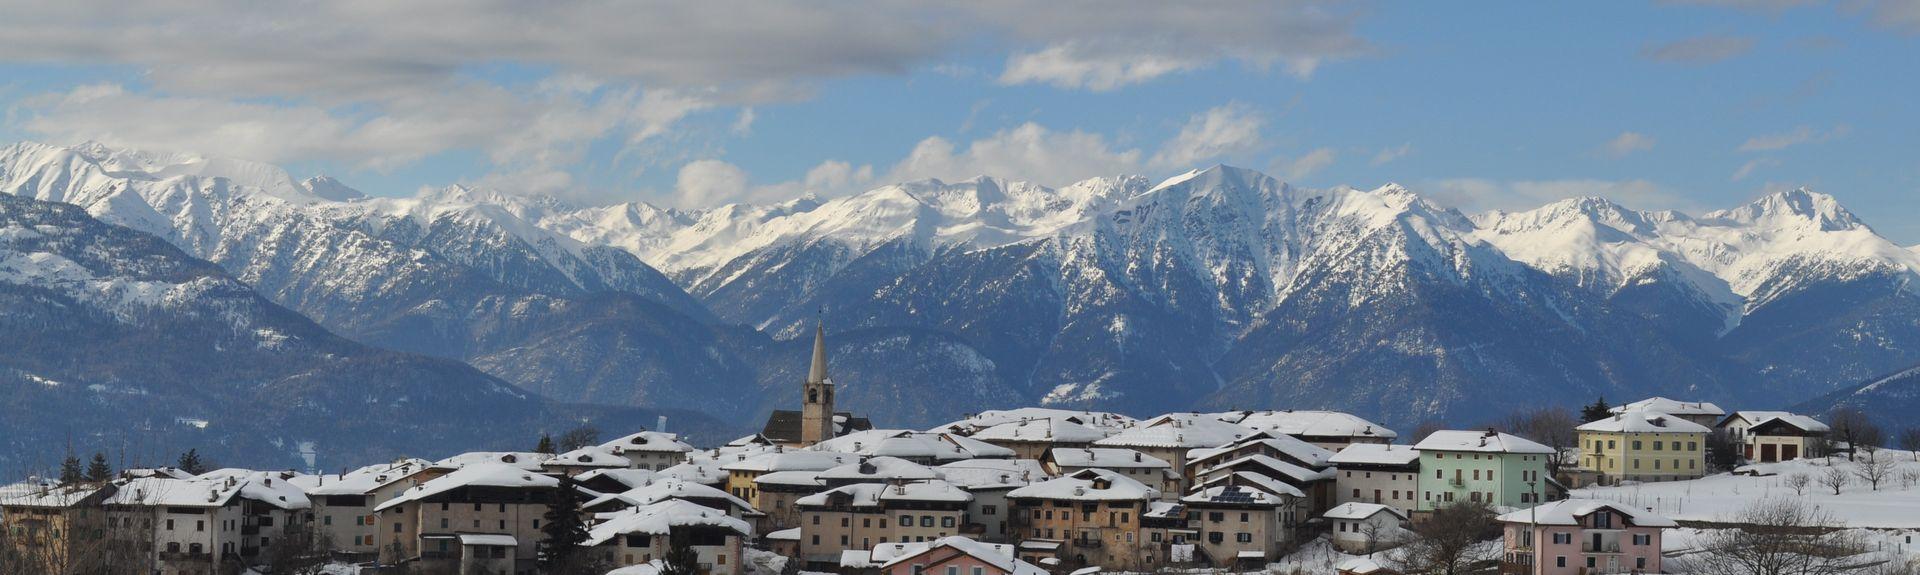 Cis, Trento, Trentino-Alto Adige/South Tyrol, Italy